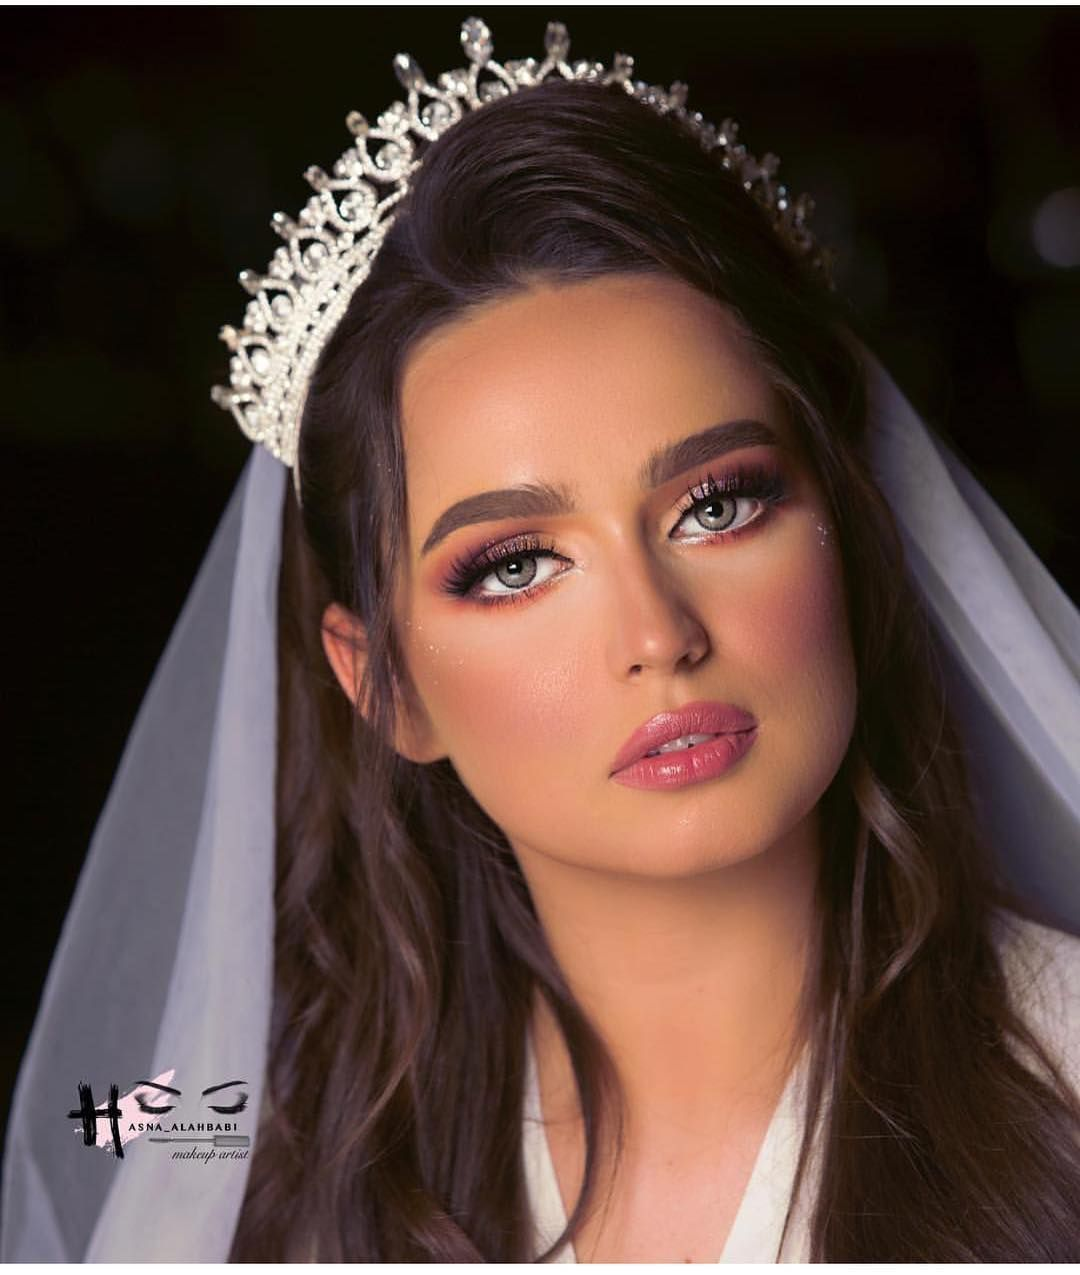 روعة ميك اب Hasna Alahbabi فنادق Brides Bride Bridal Wedding Weddingnight Weddingday Love Wed Dramatic Wedding Makeup Makeup Makeover Fashion Makeup